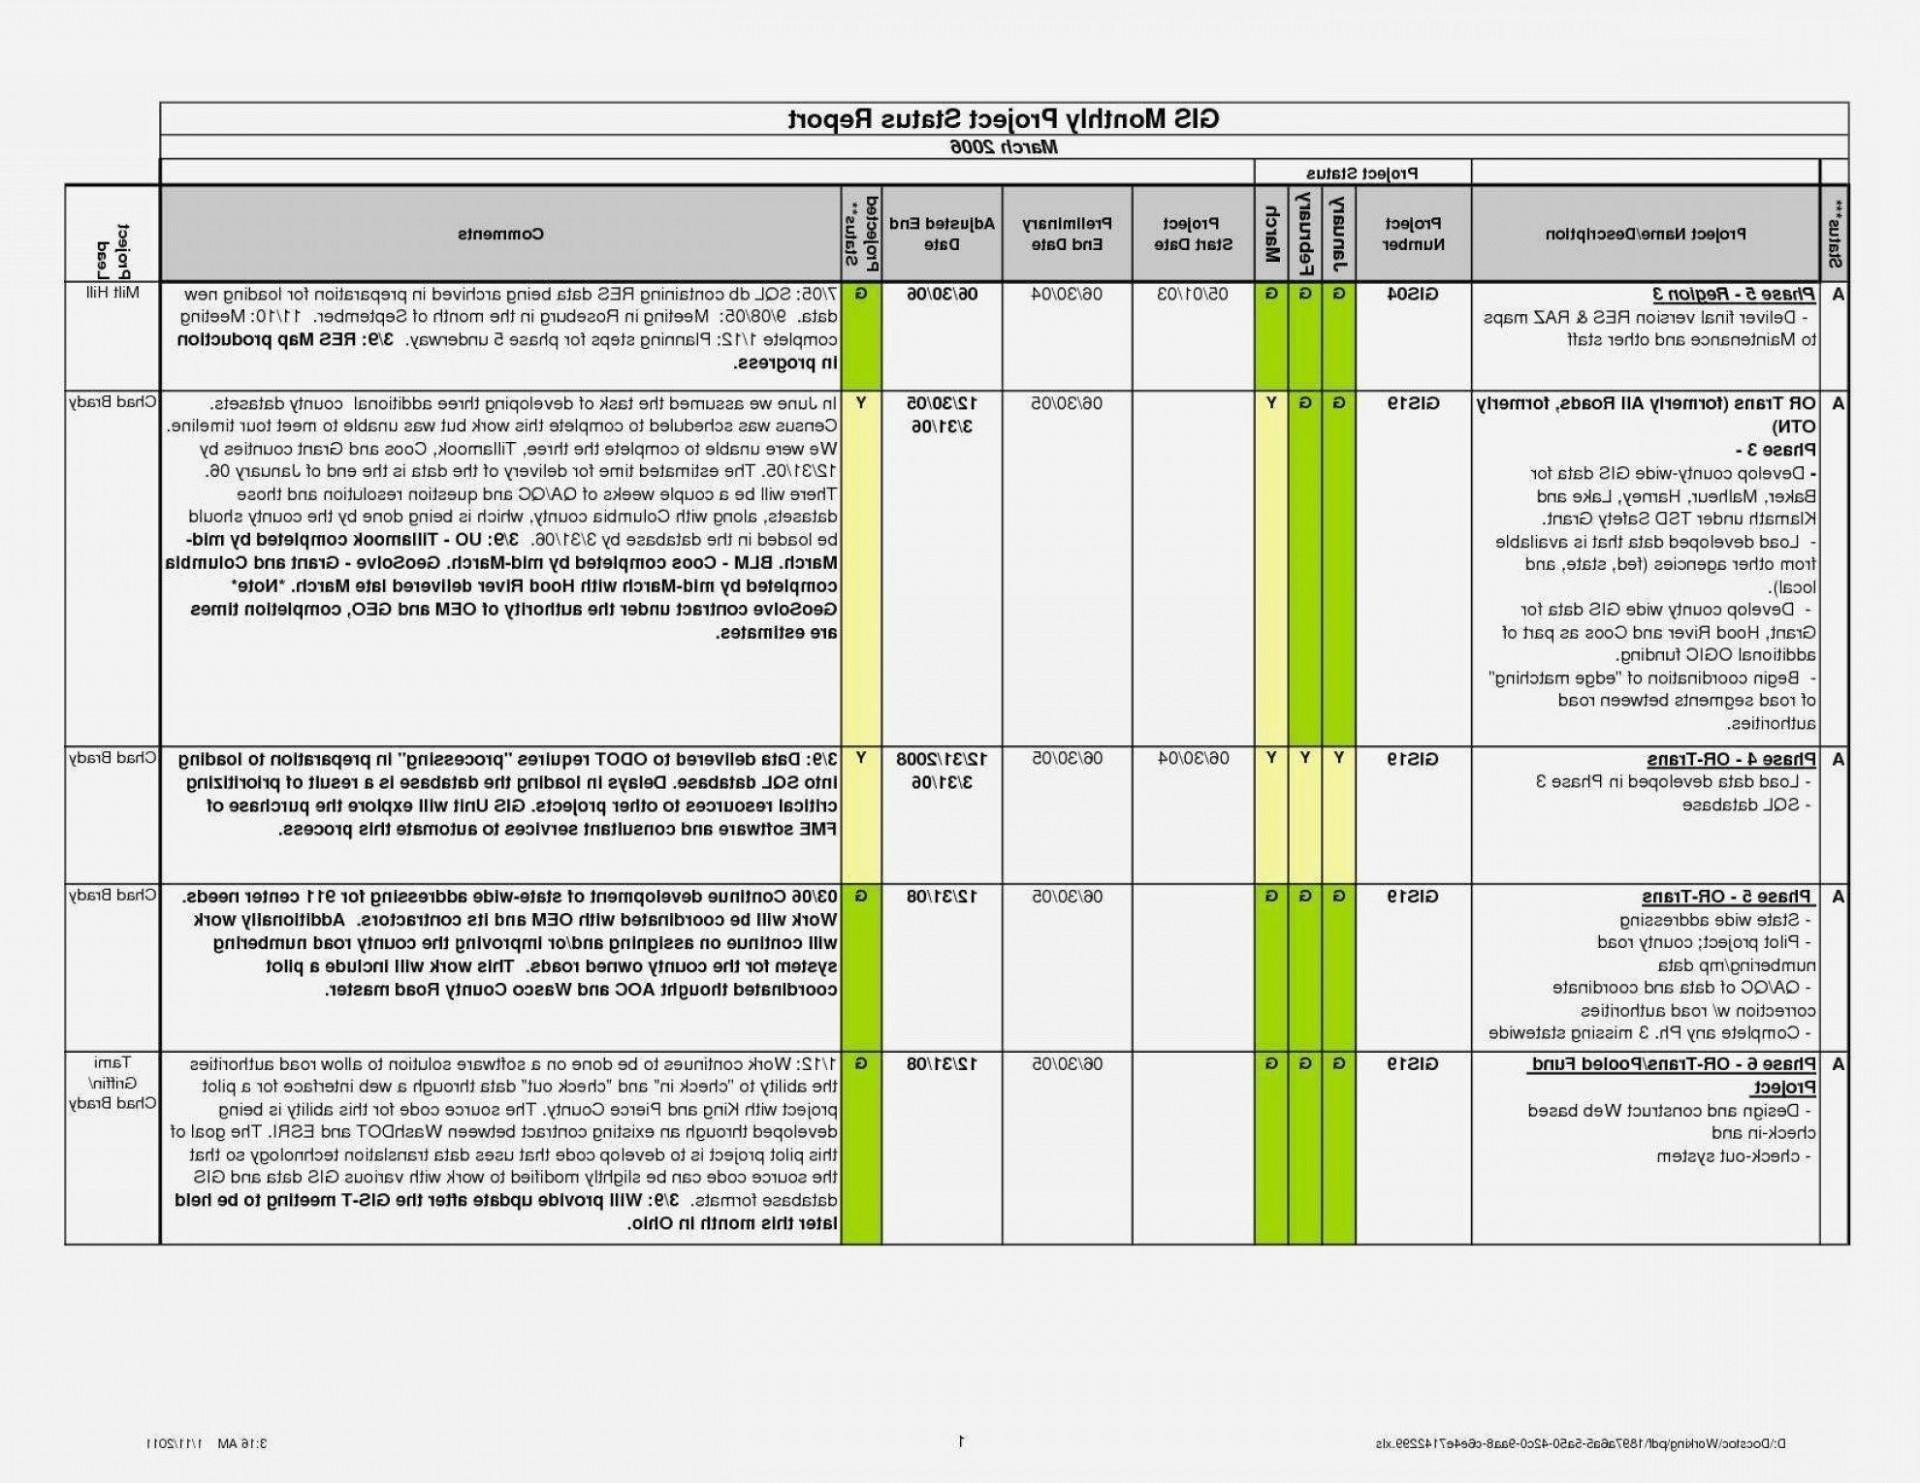 000 Singular Project Management Statu Report Template Image  Format Ppt Word1920